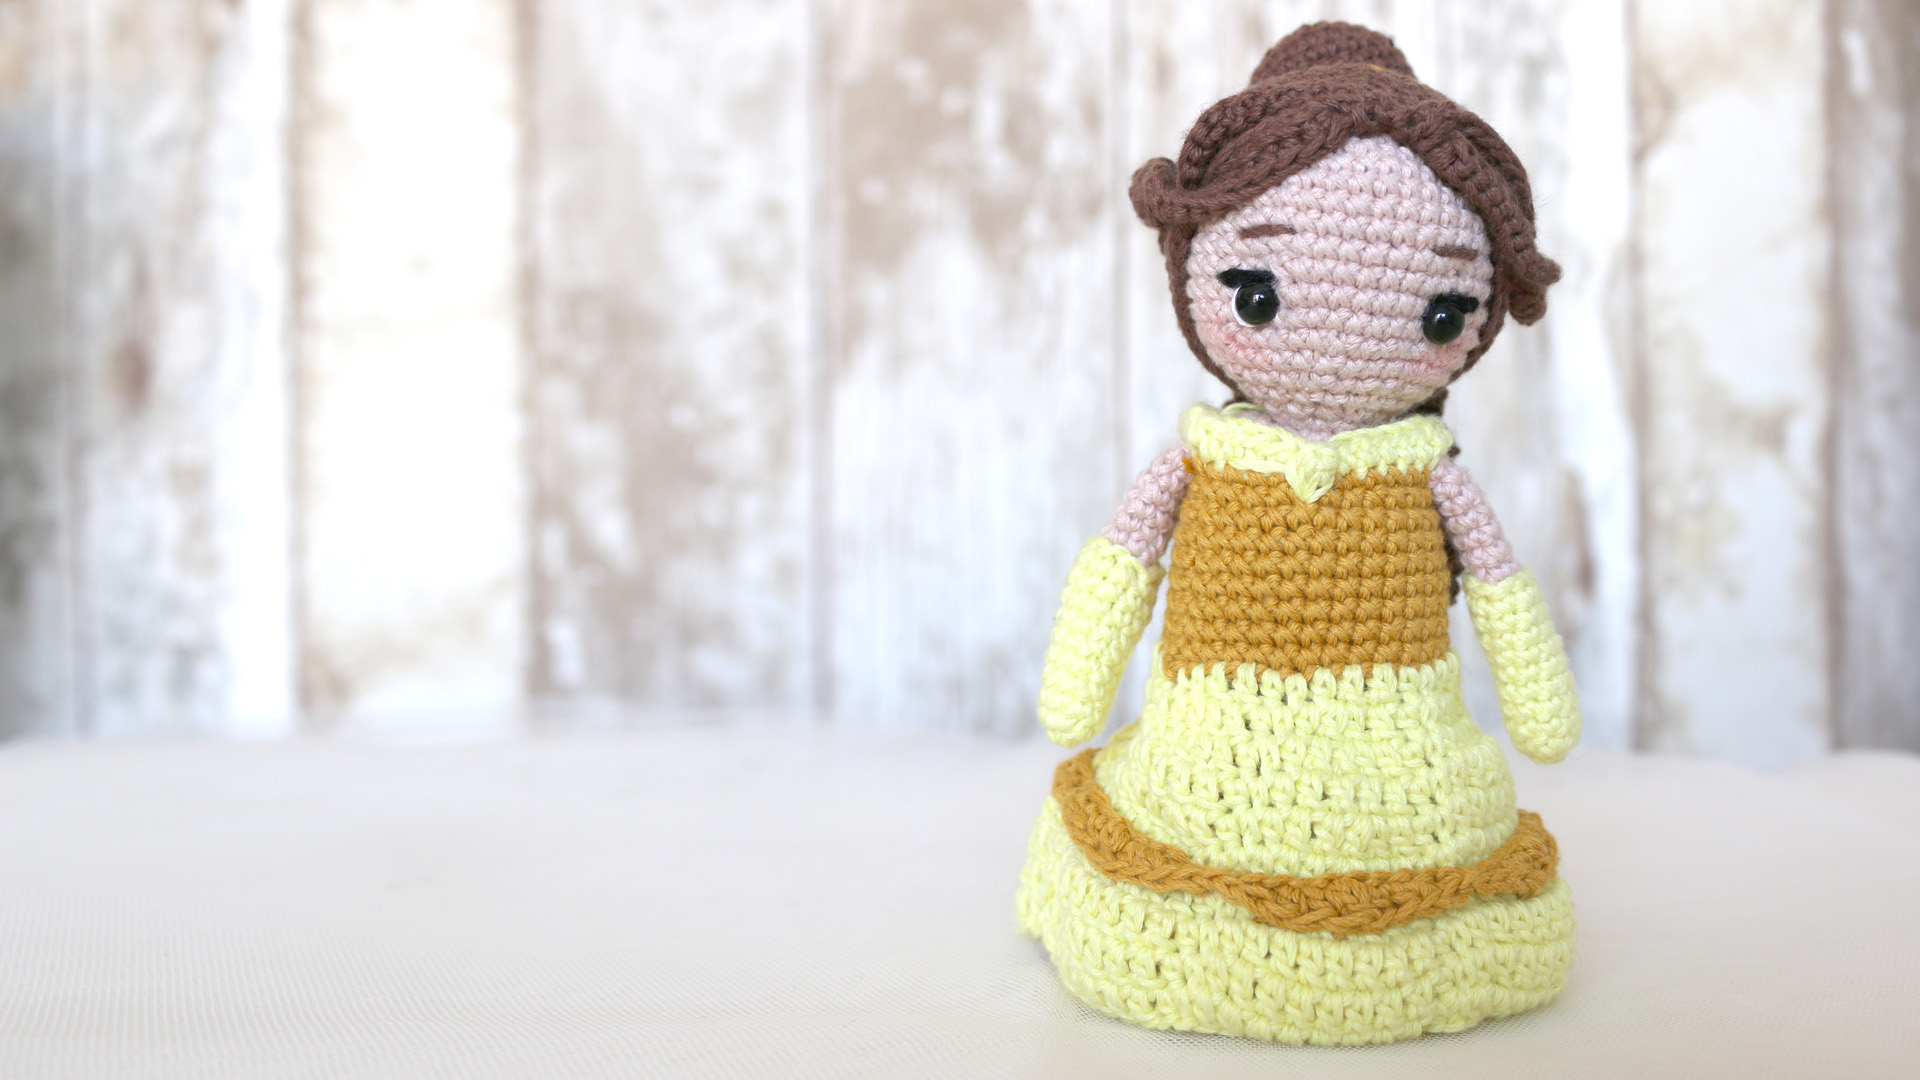 bella princess disney amigurumi free pattern with video tutorial